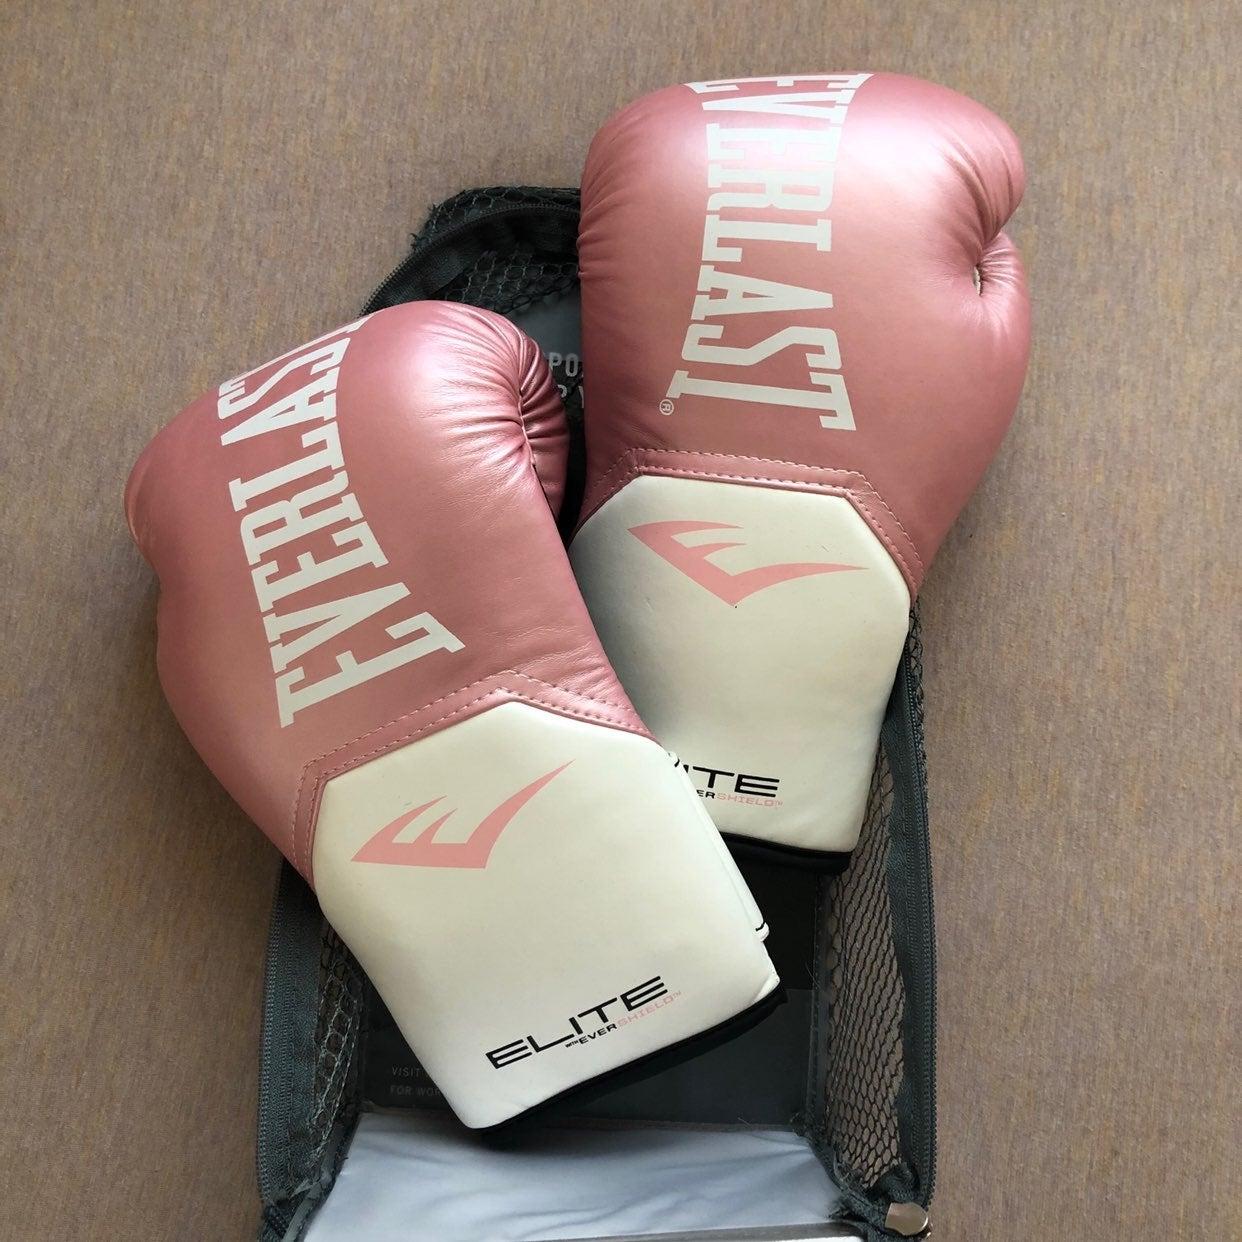 Everlast elite pink training gloves